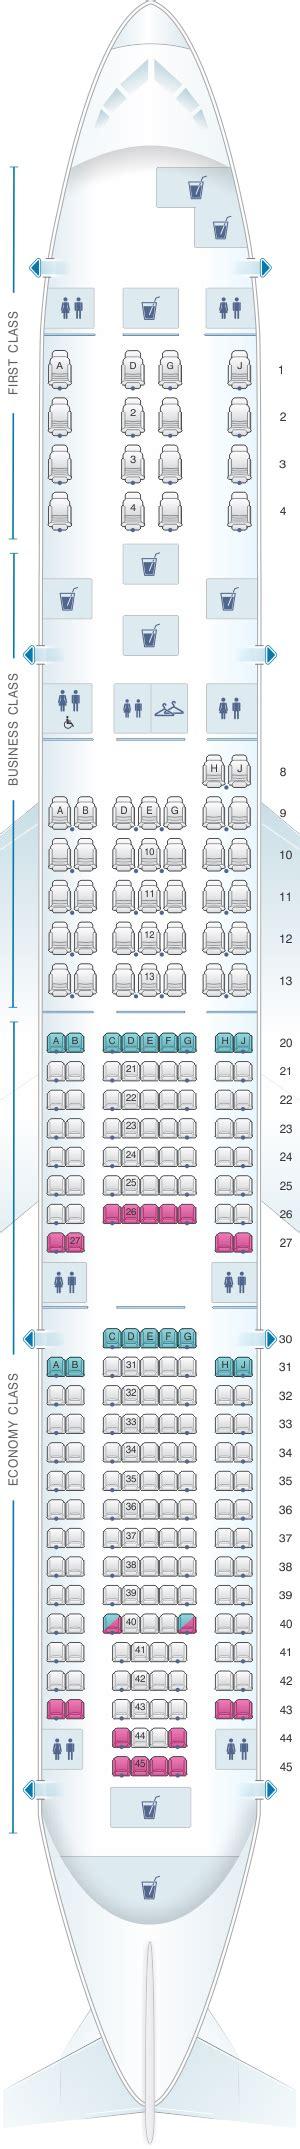 boeing 777 200 sieges plan de cabine airlines boeing b777 200